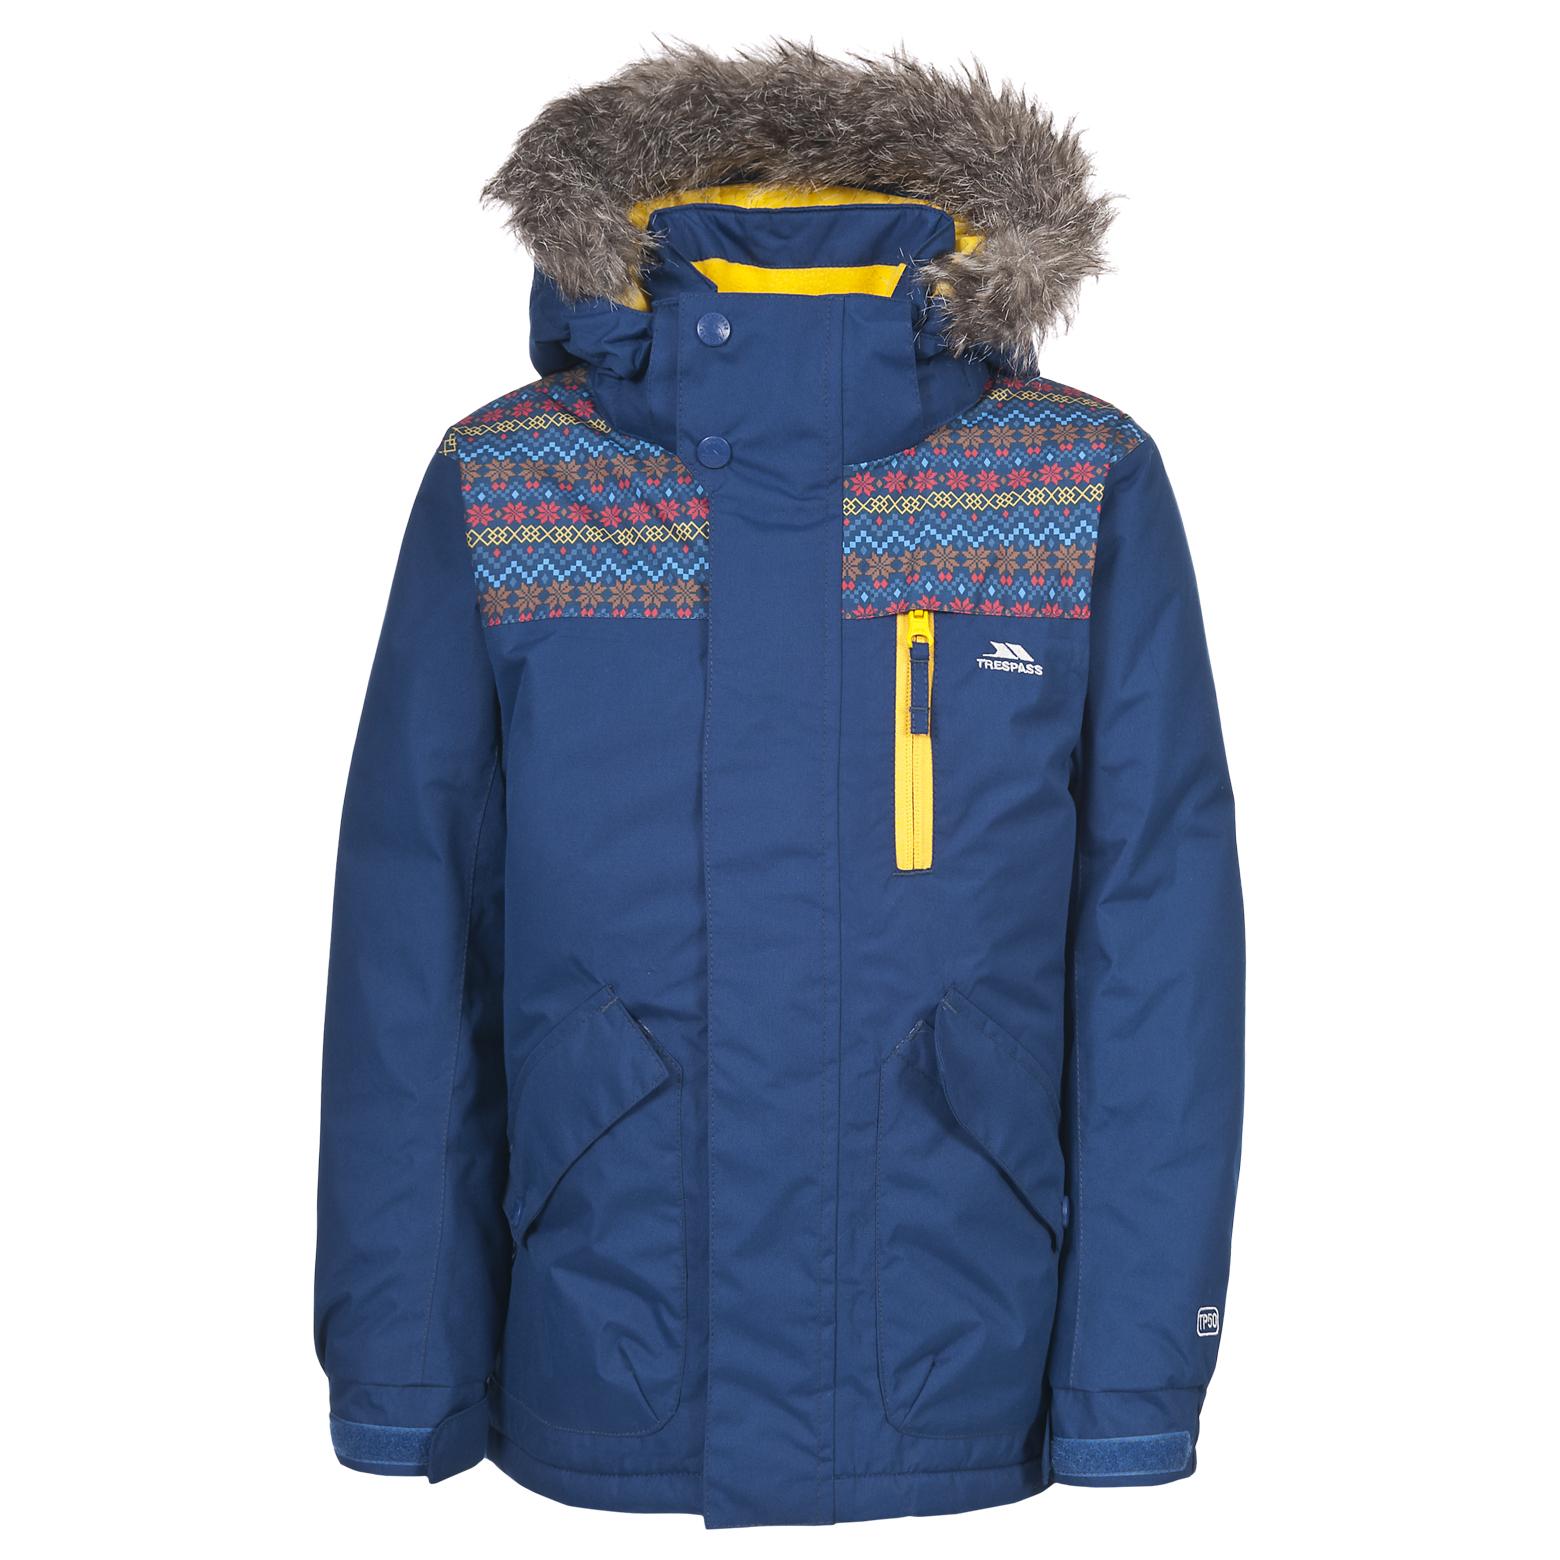 trespass porter kids boys waterproof padded winter snow ski coat #0: porter mcjkskj twi a copy